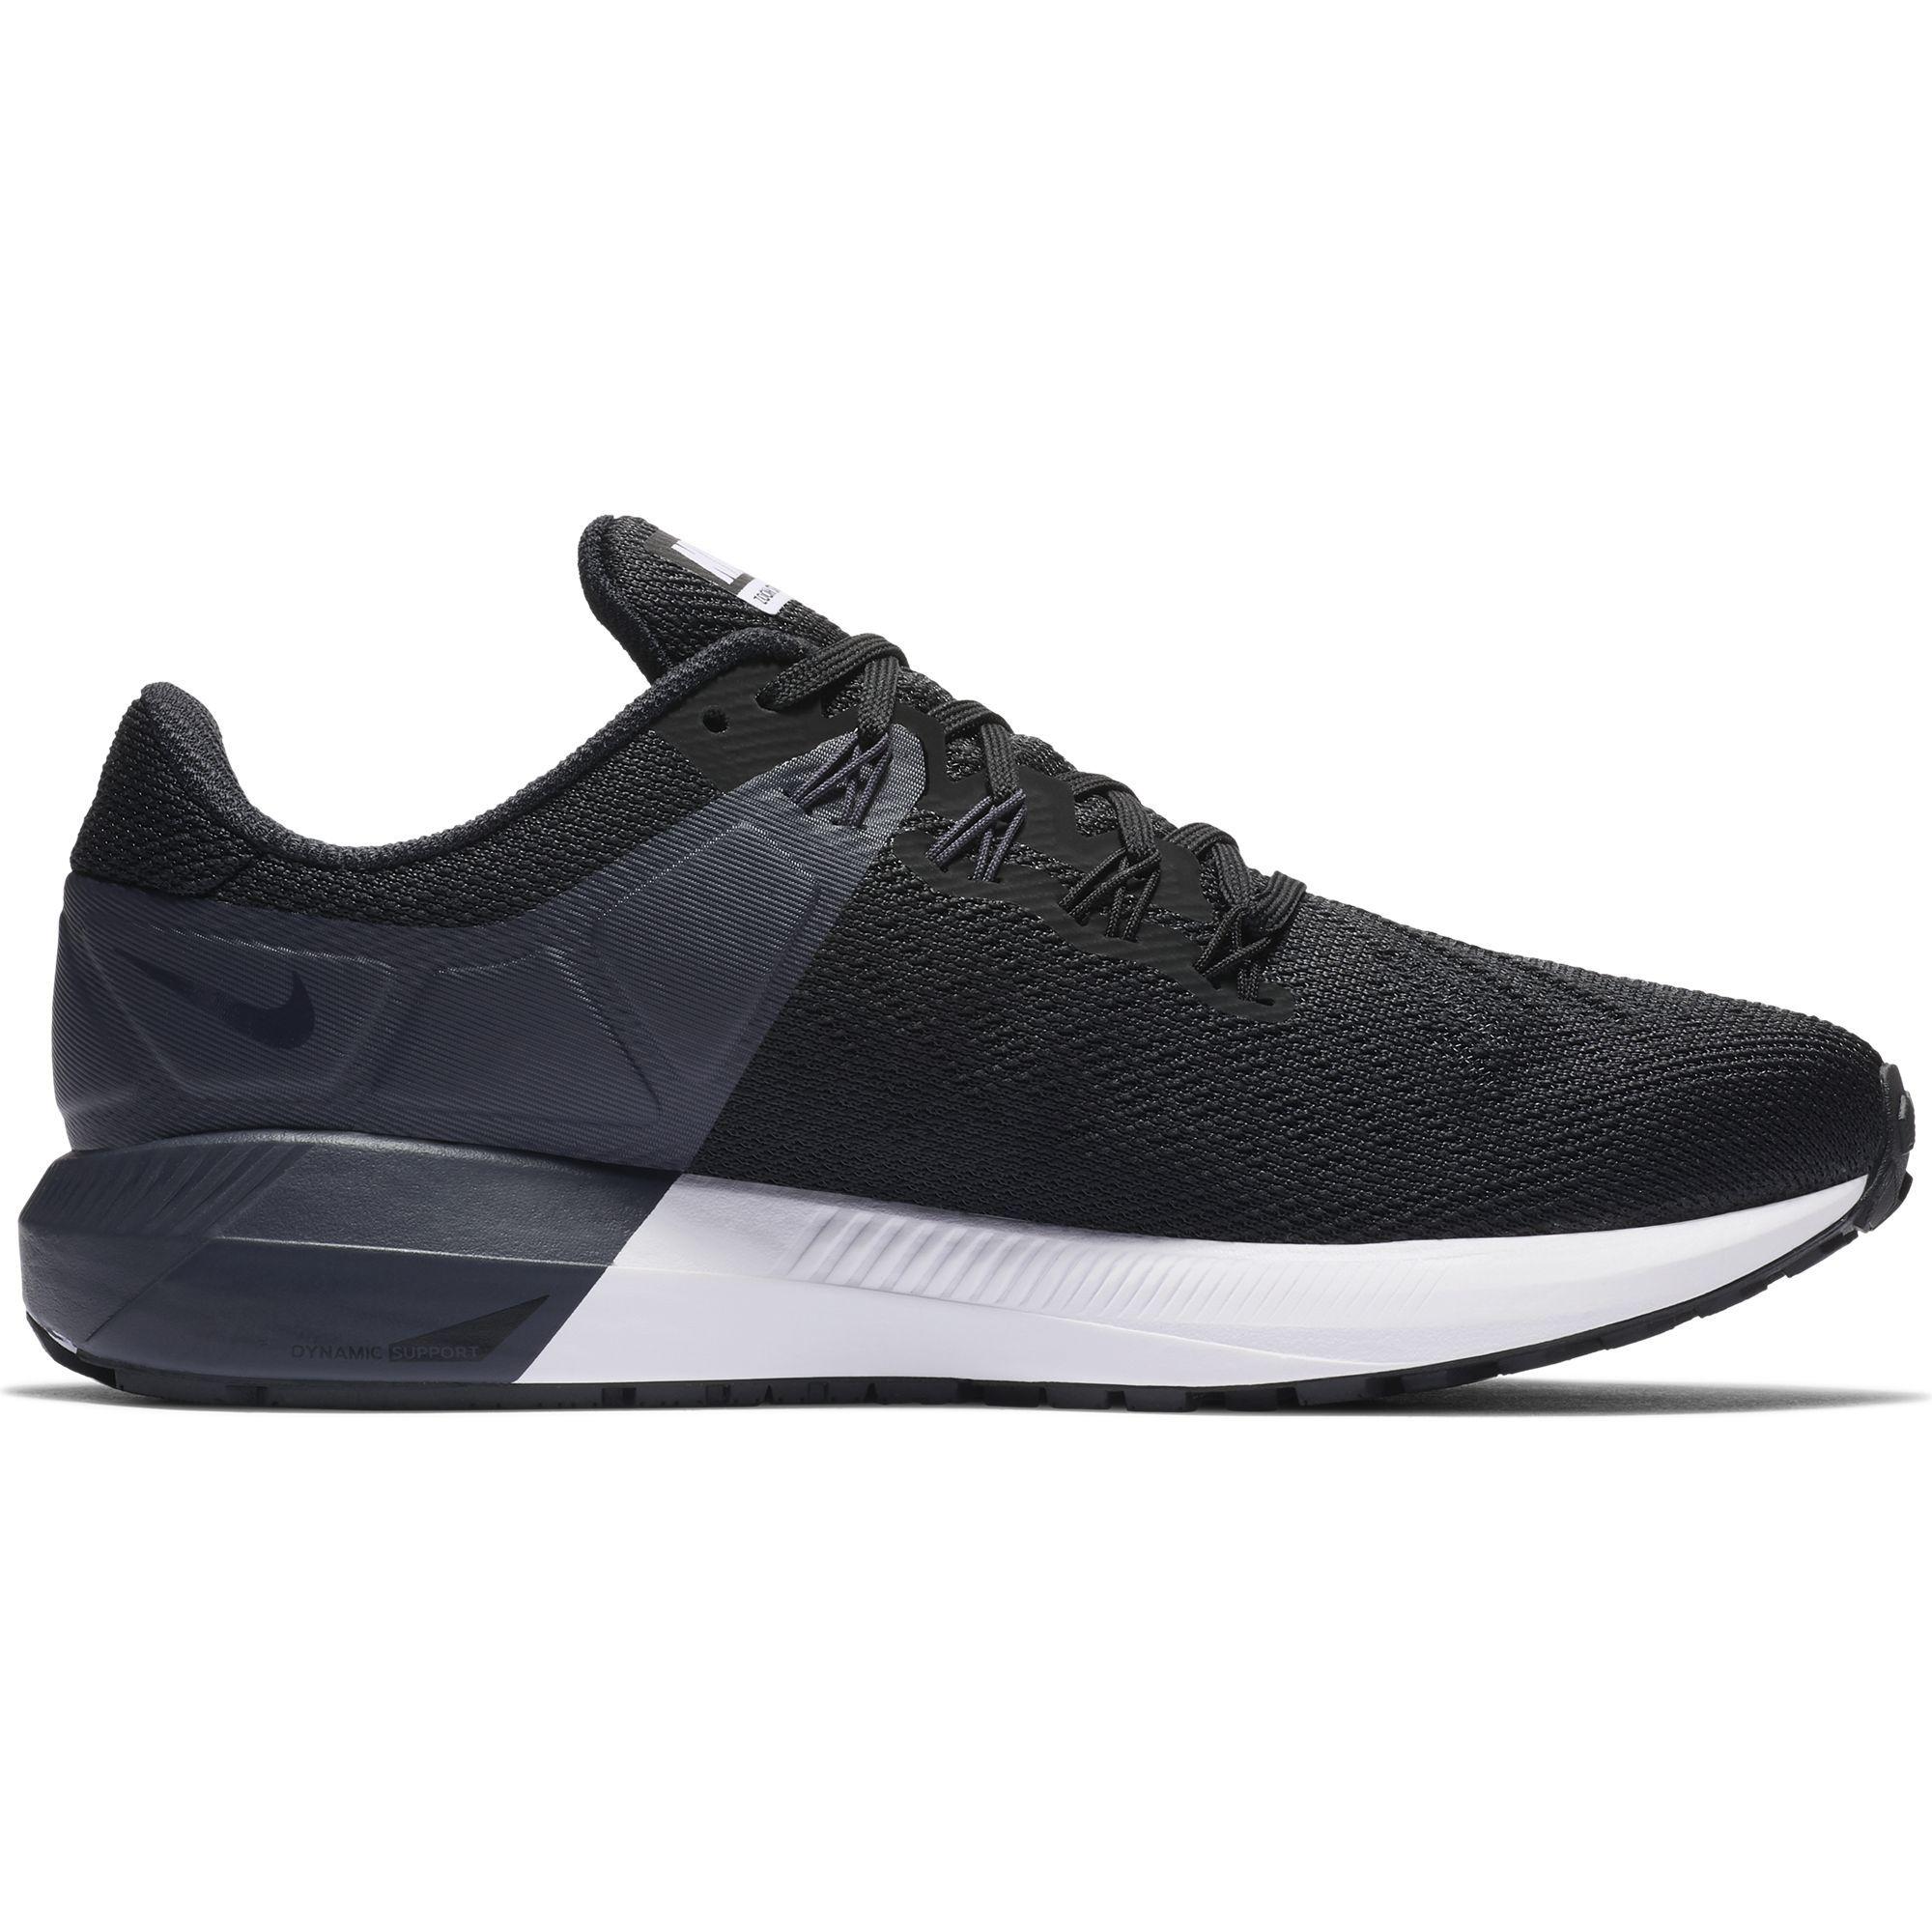 Nike Lady Air Zoom Structure 22 (Schwarz Weiß)